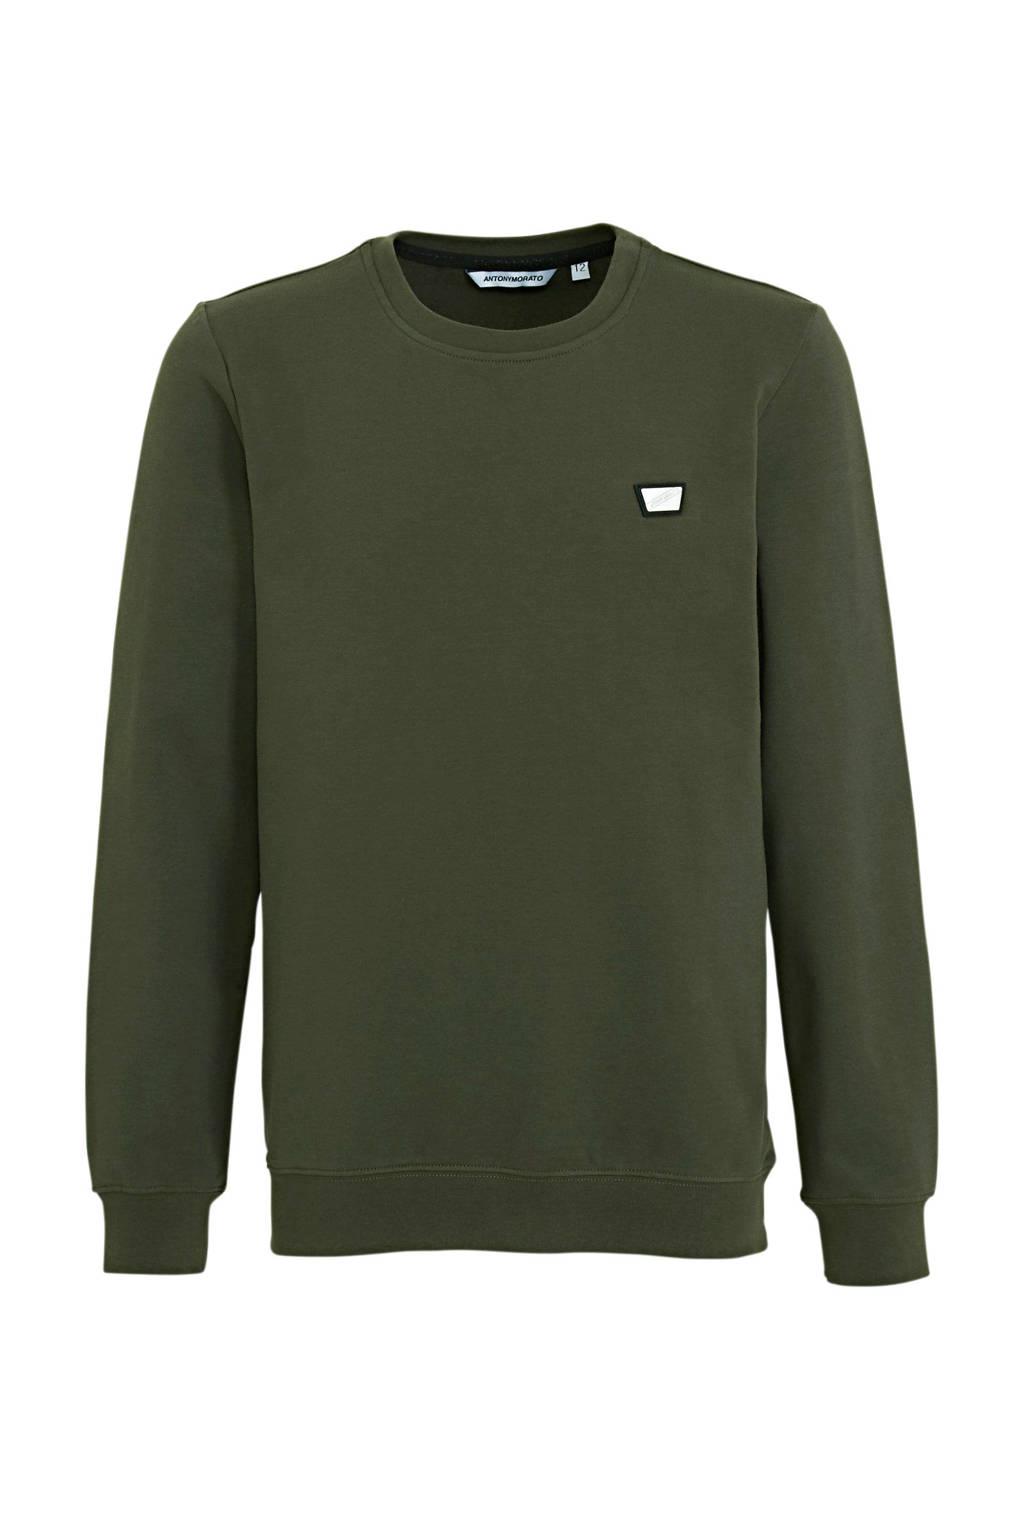 Antony Morato sweater met logo army groen, Army groen